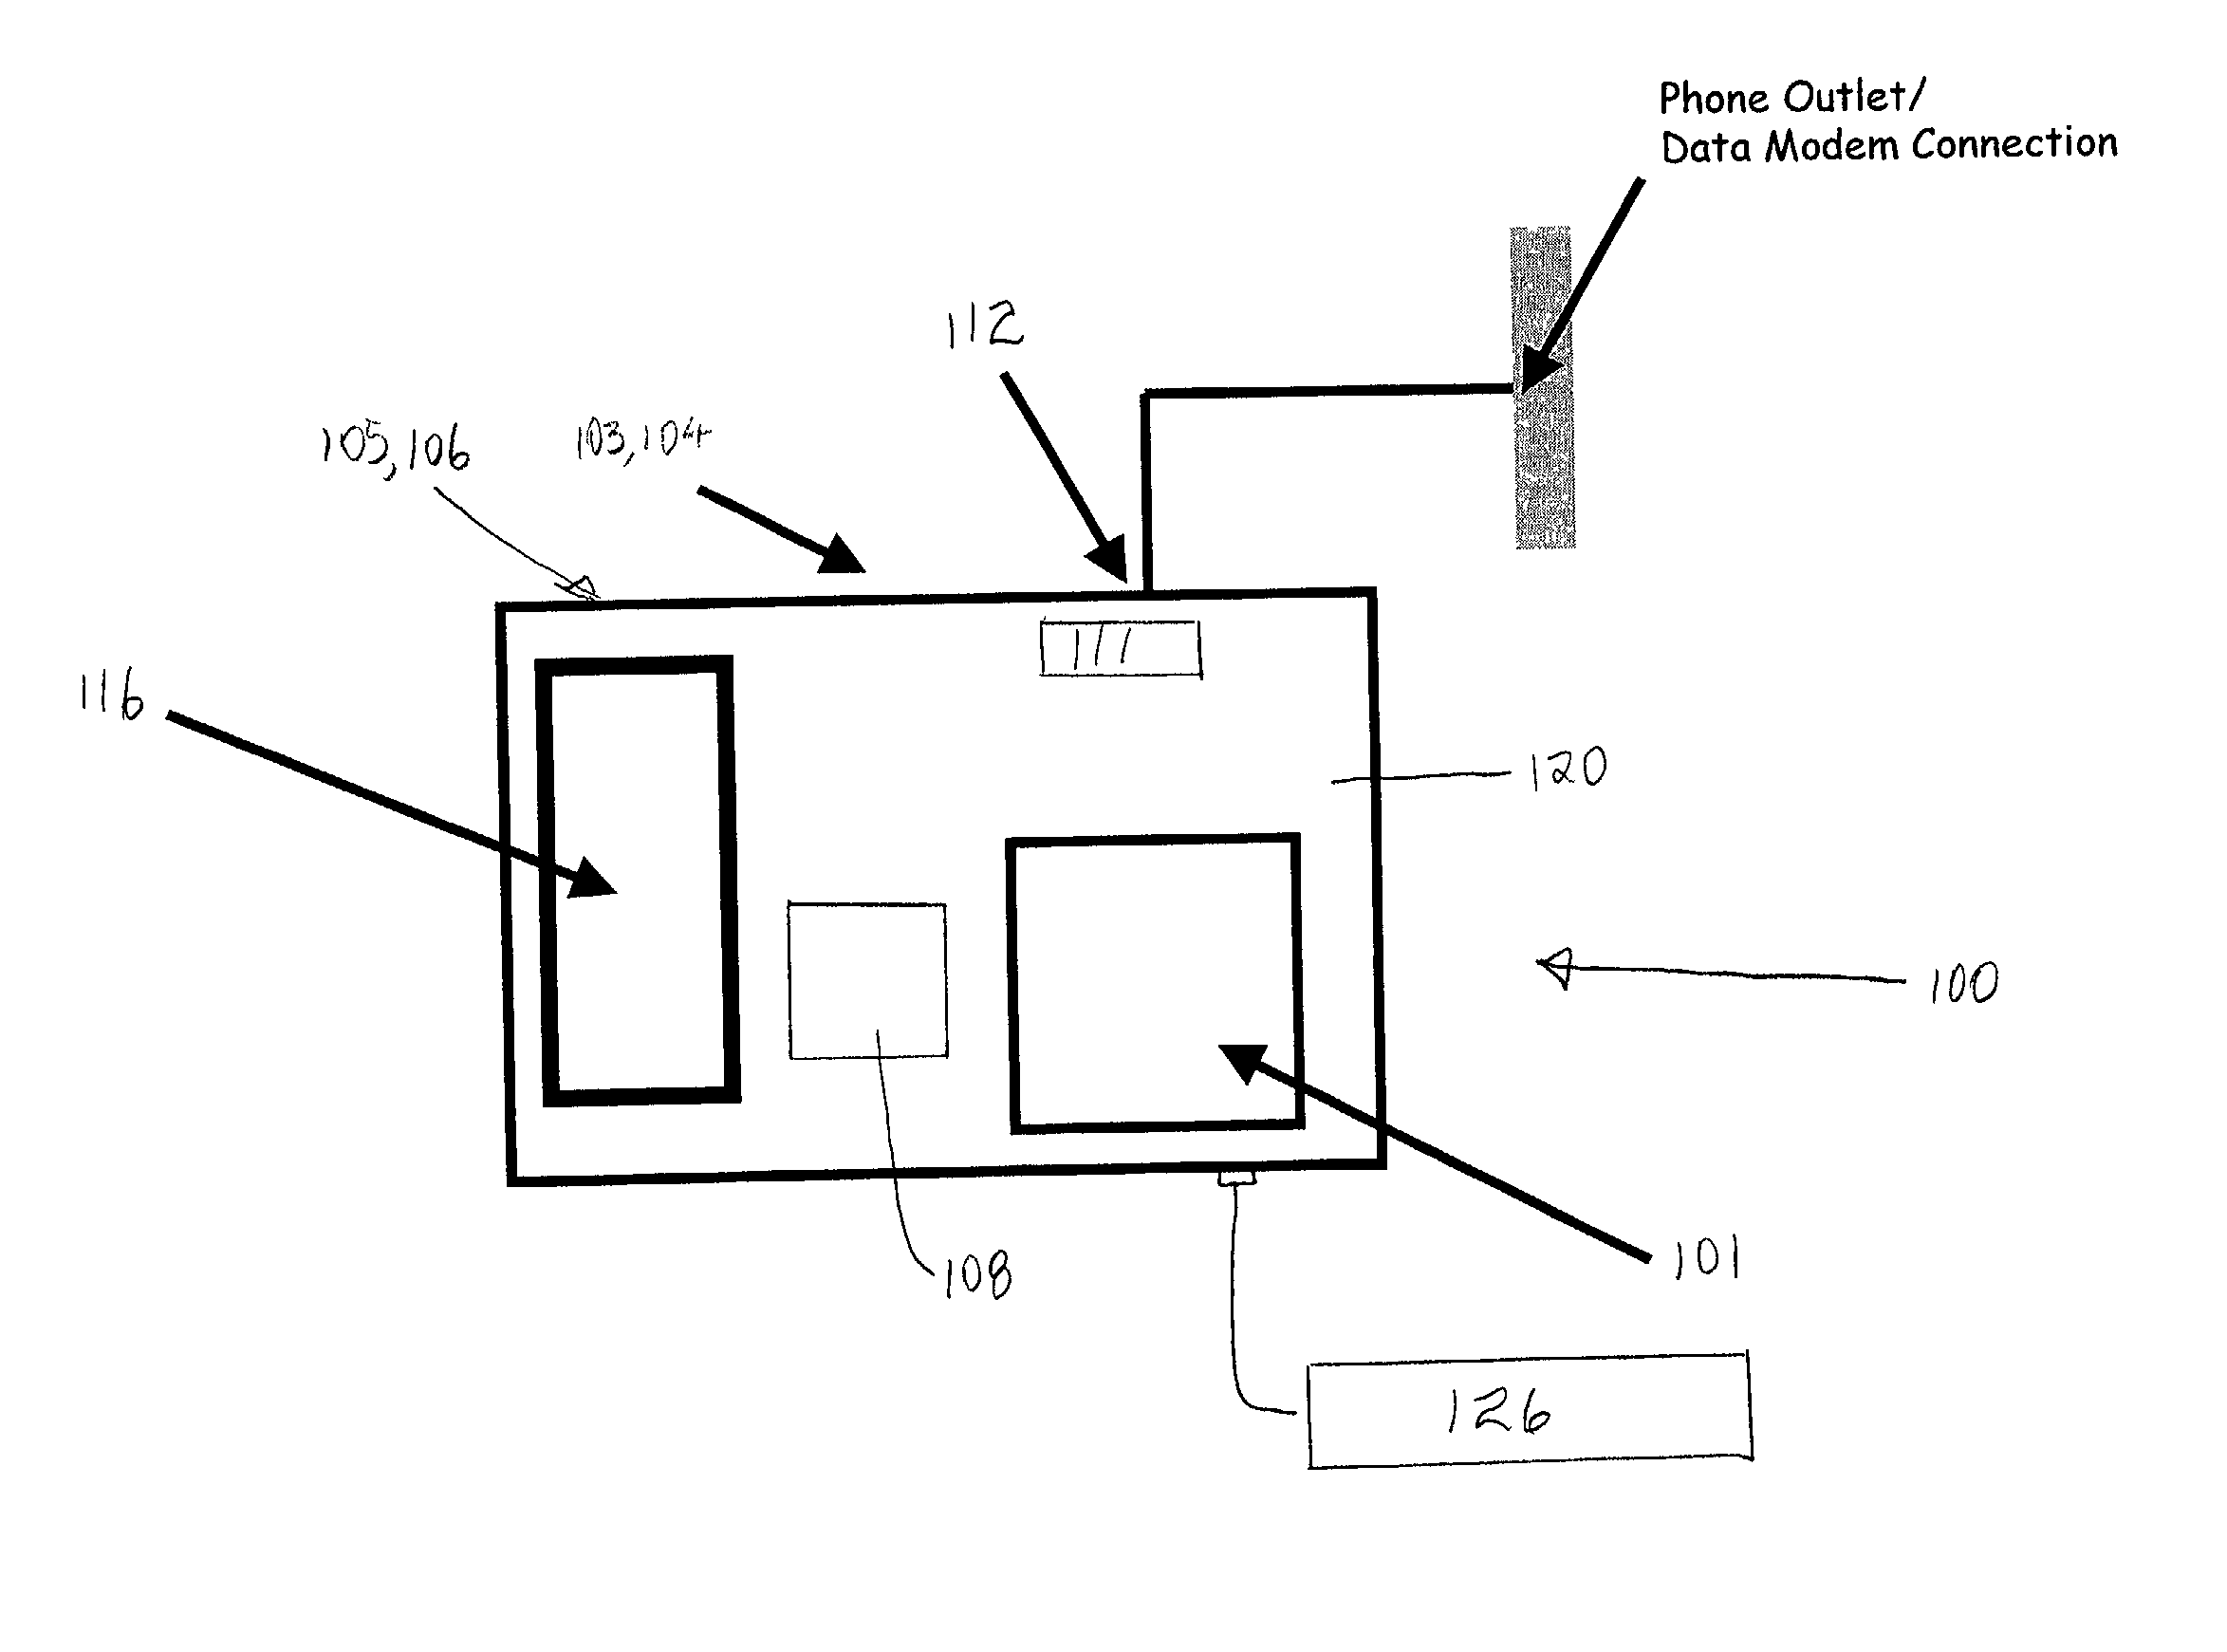 a modem to connect a fax machine